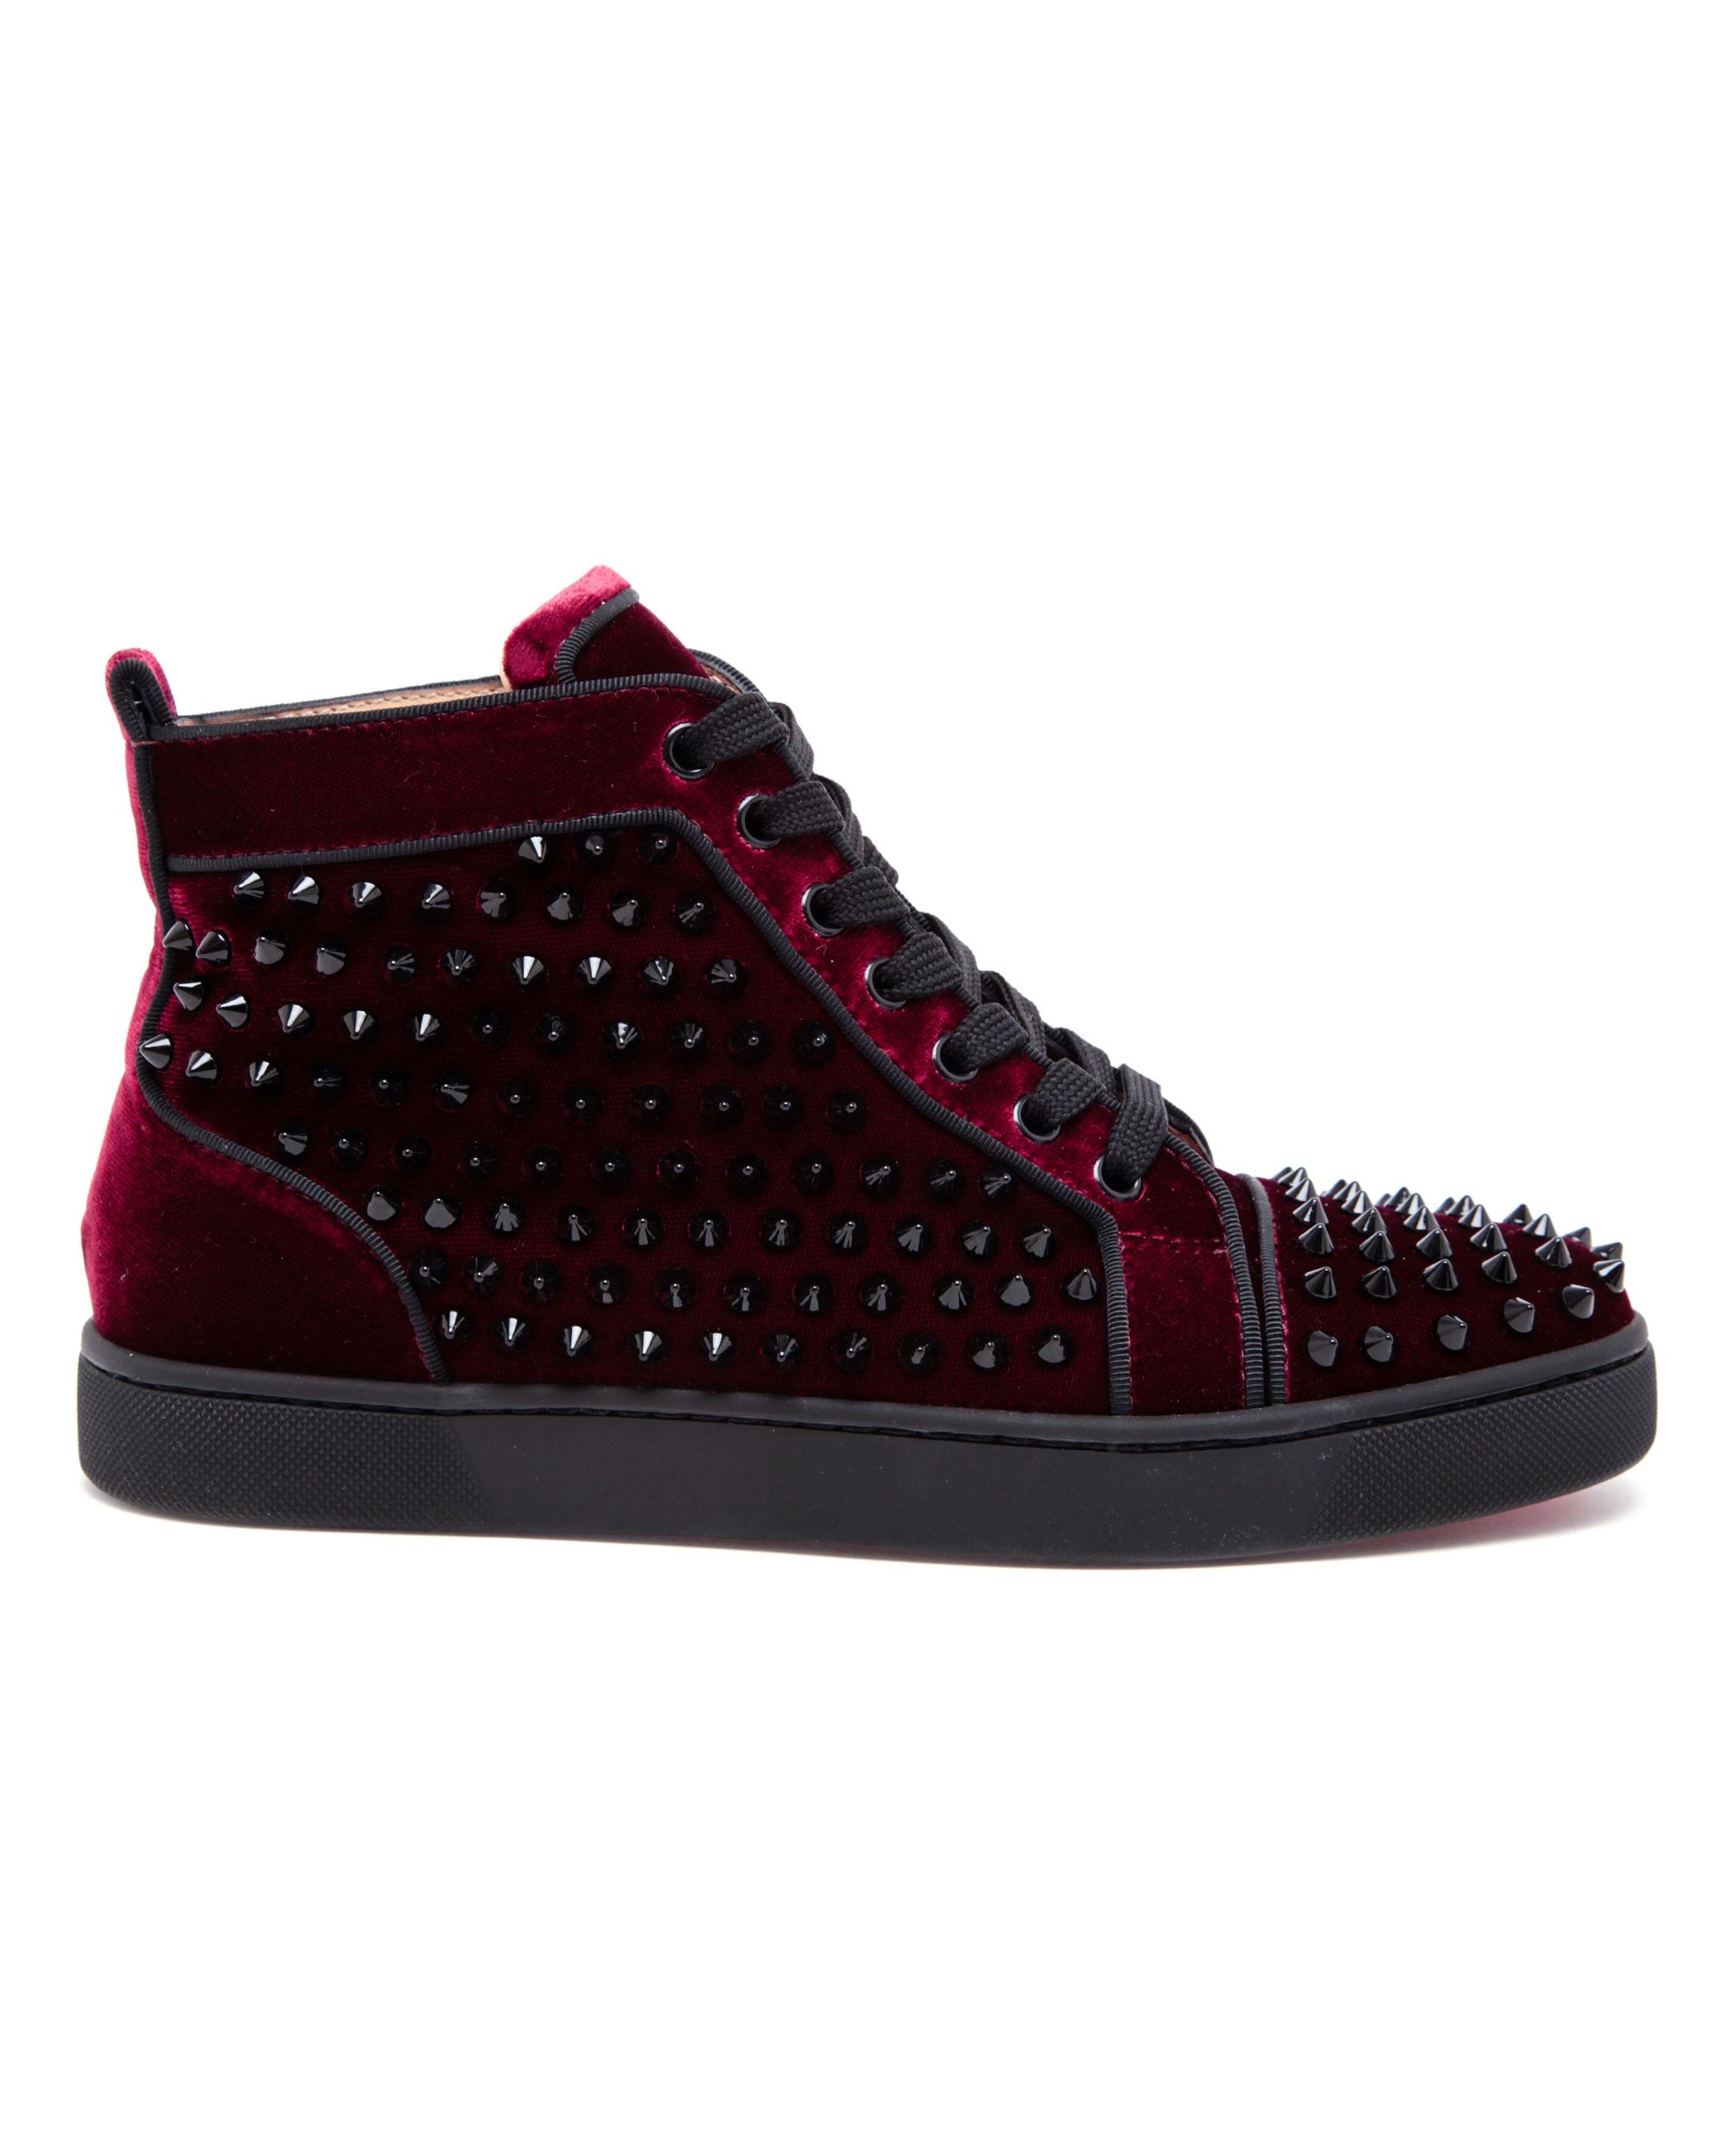 christian louboutin Louis high-top sneakers black leather logo ...